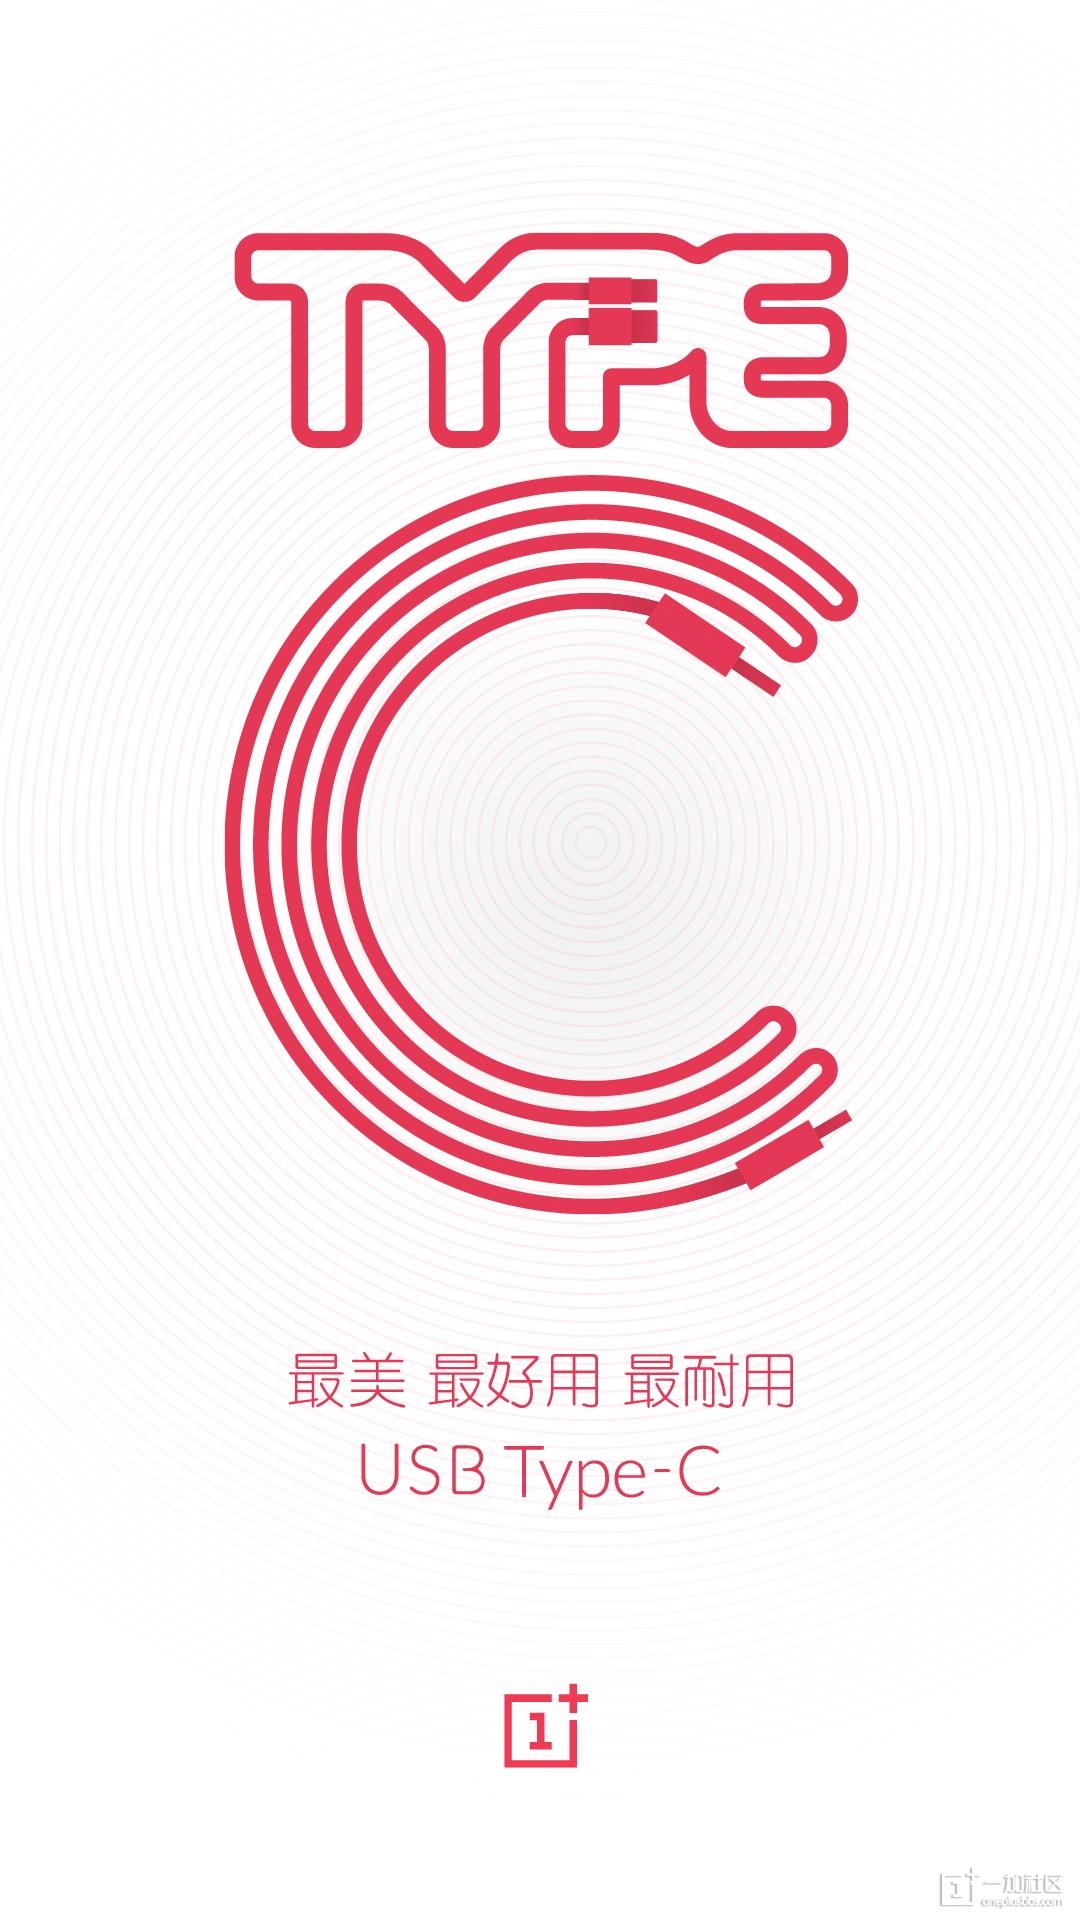 0623-Type-C.jpg